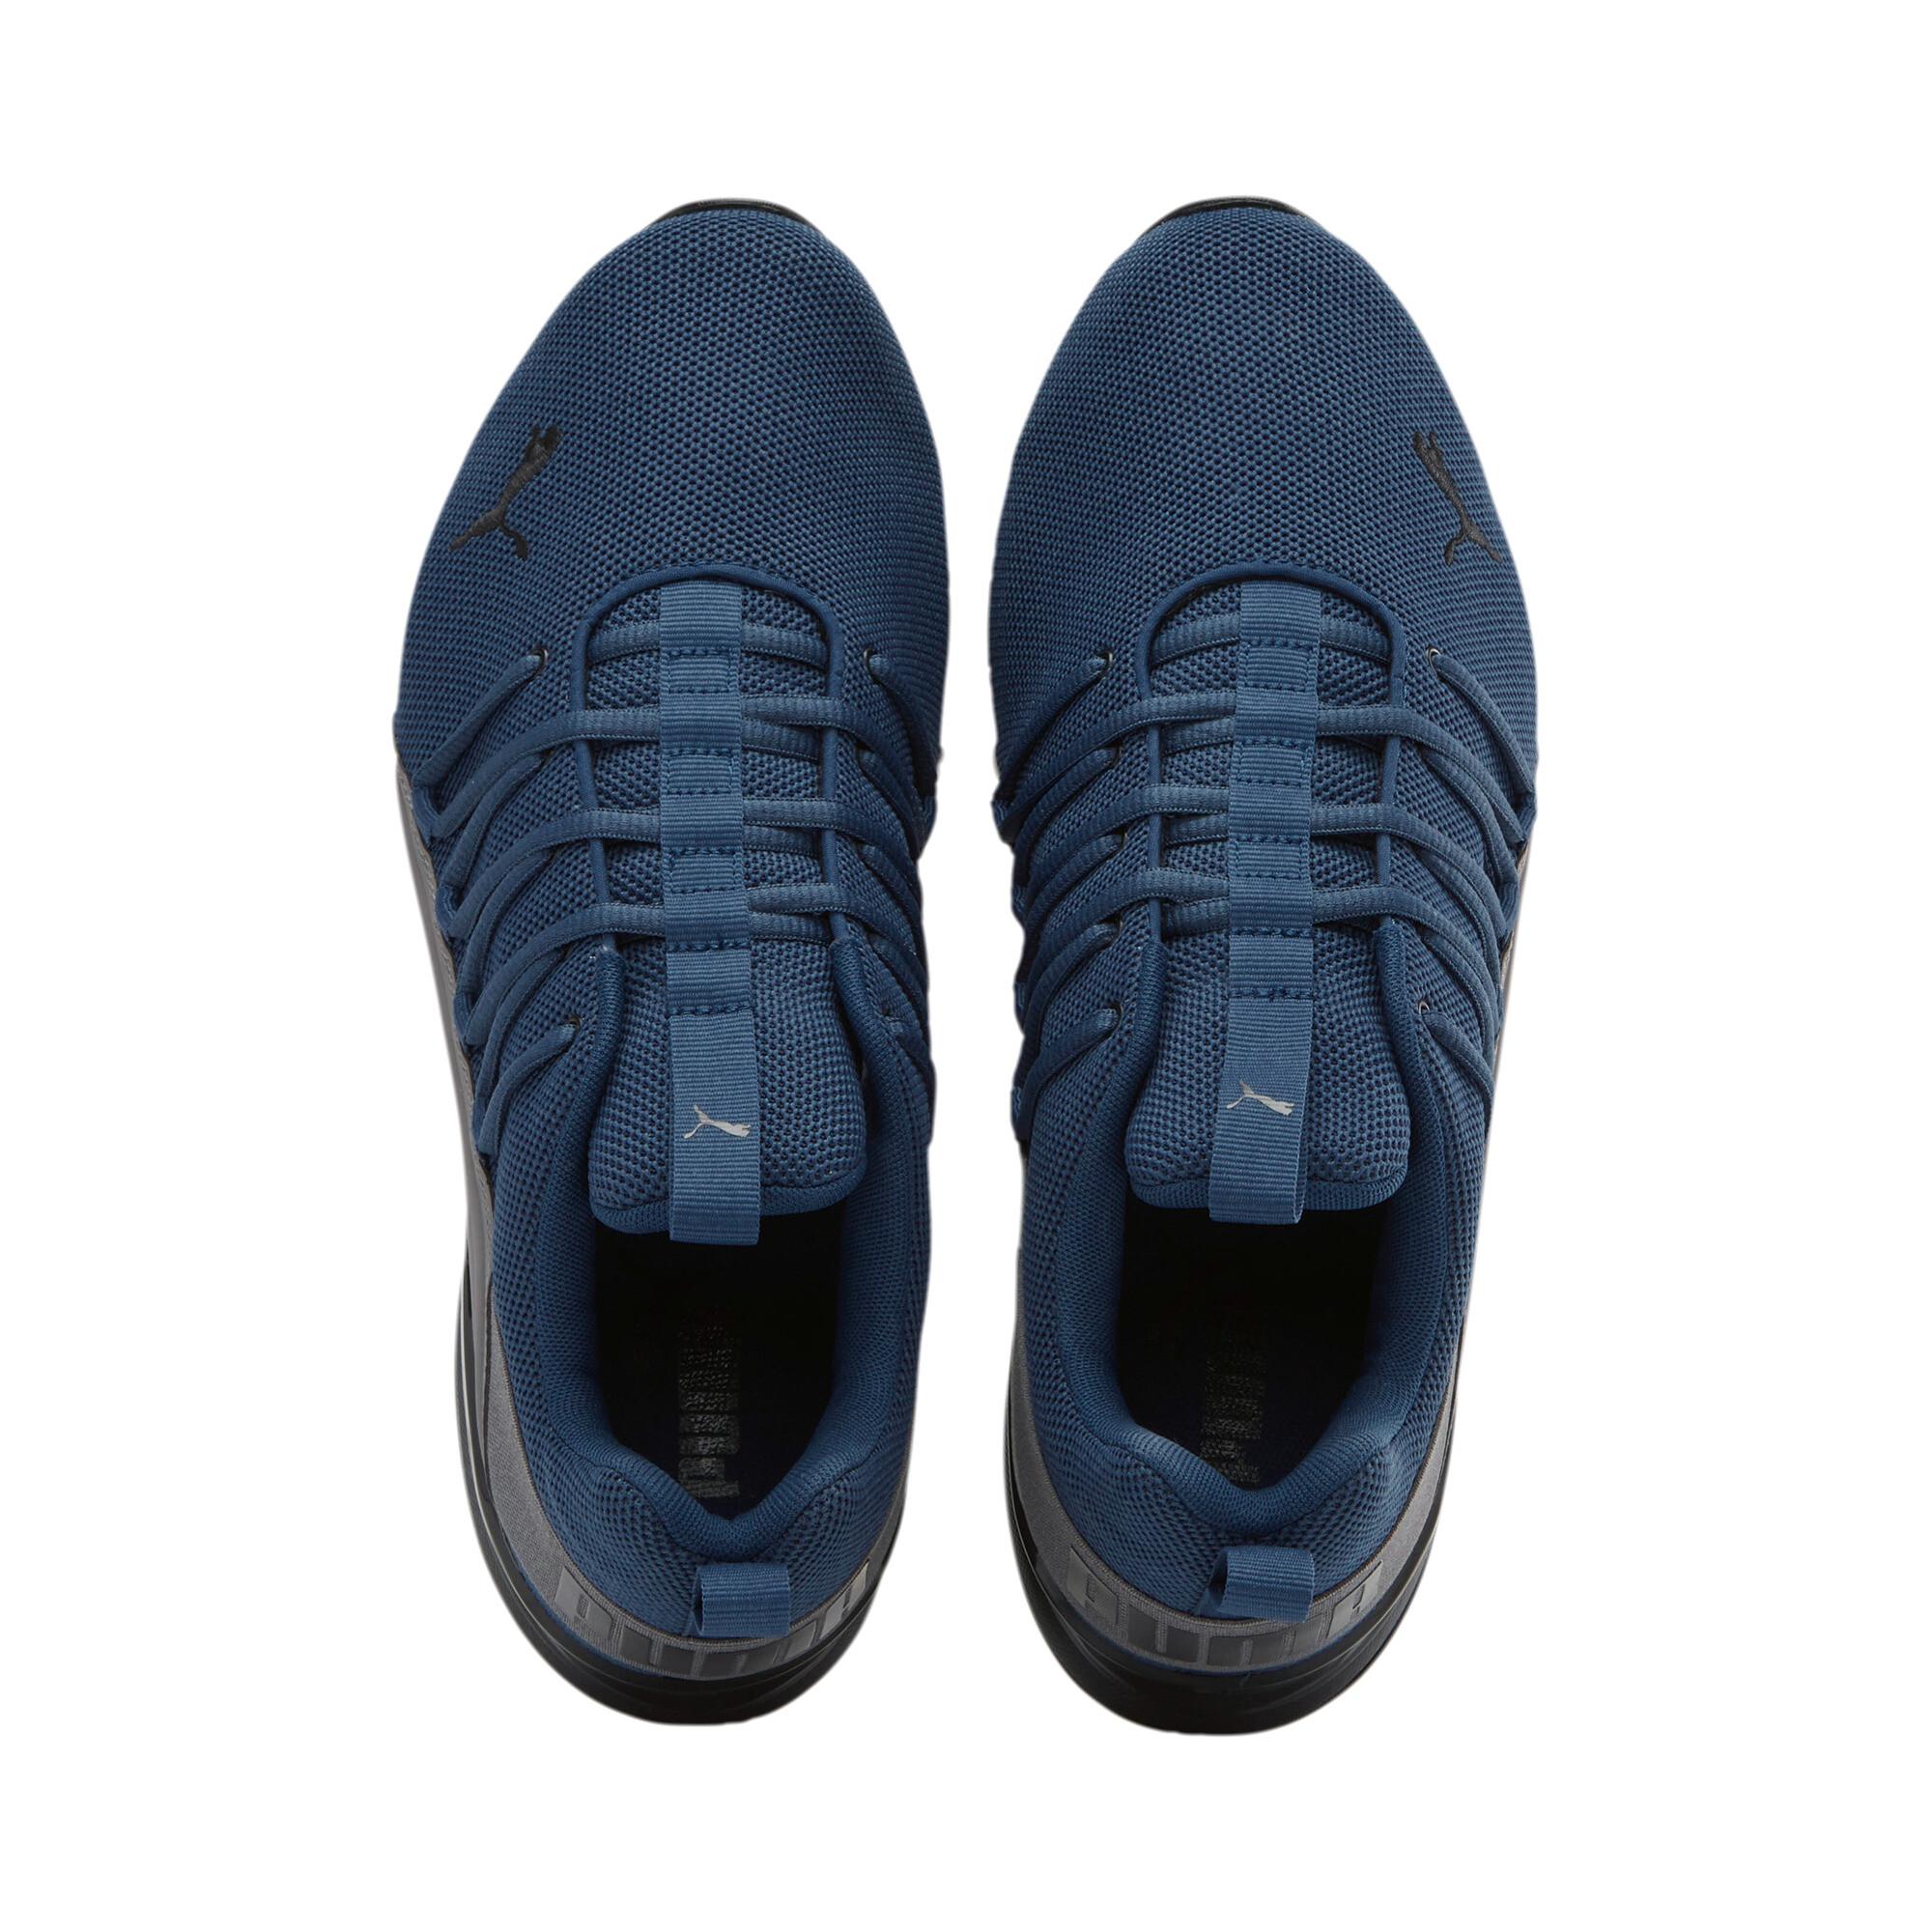 PUMA-Momenta-Men-039-s-Training-Shoes-Men-Shoe-Running thumbnail 25